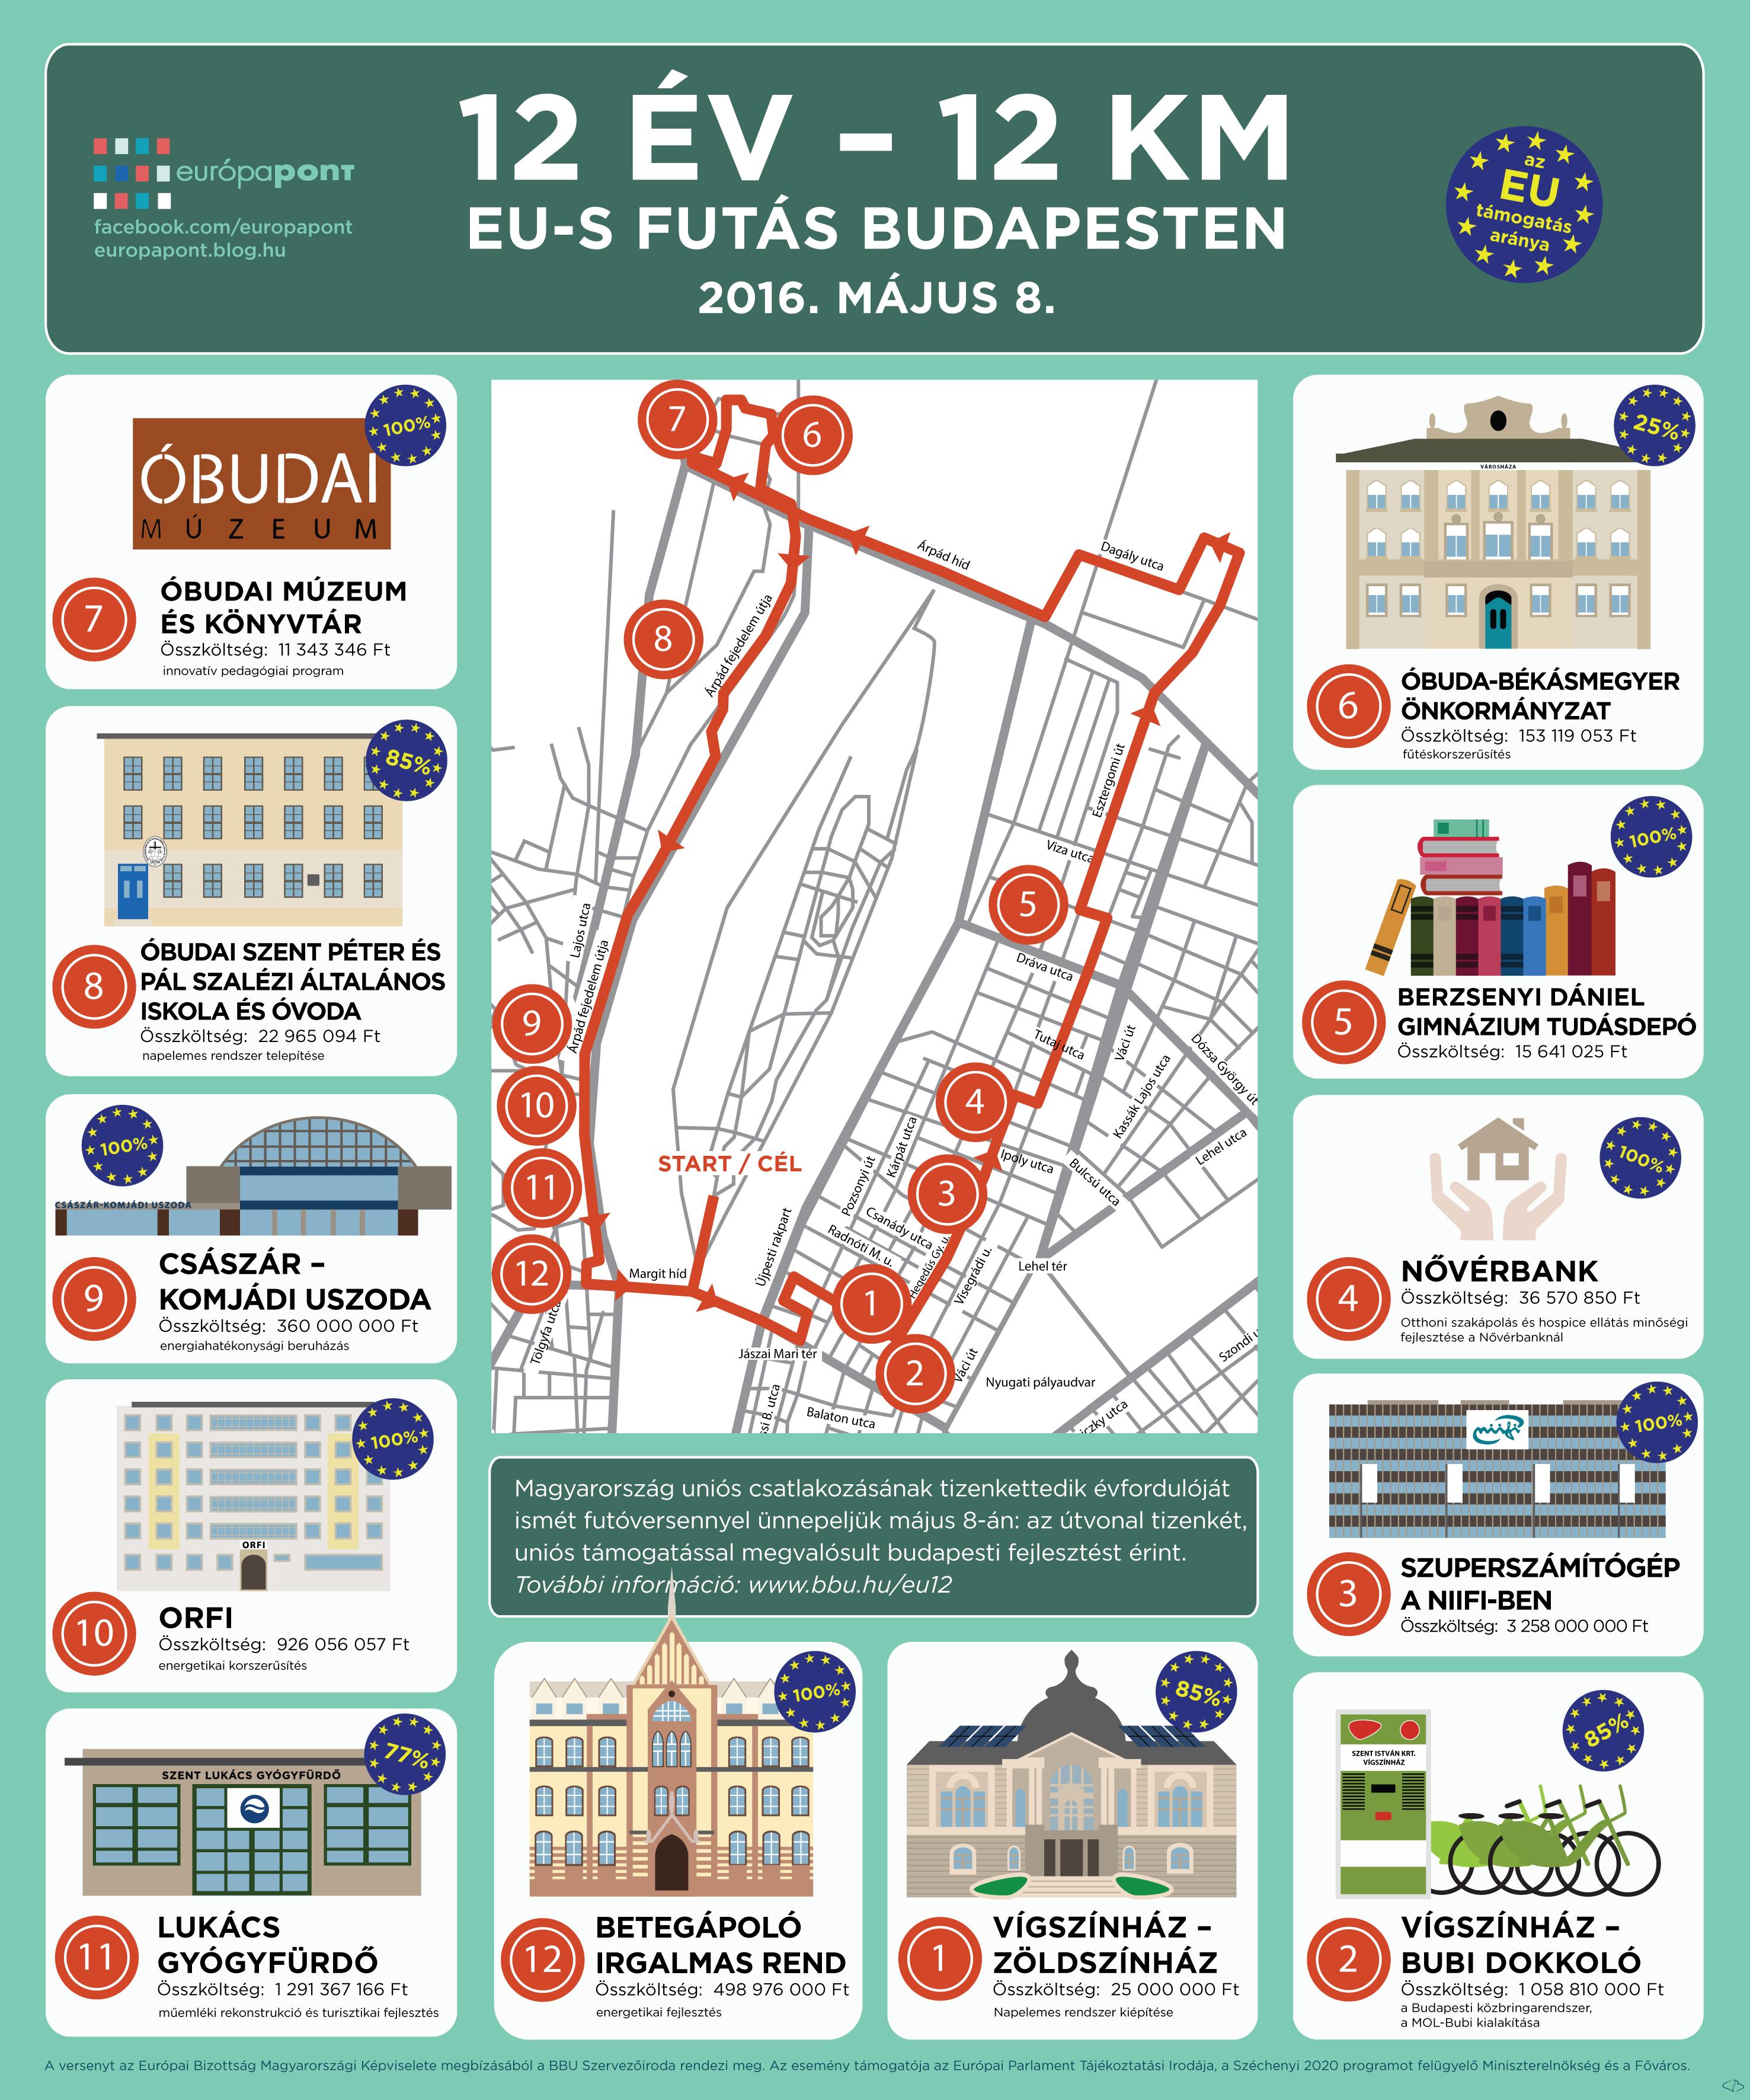 infografika_12ev_12km_futas2.png